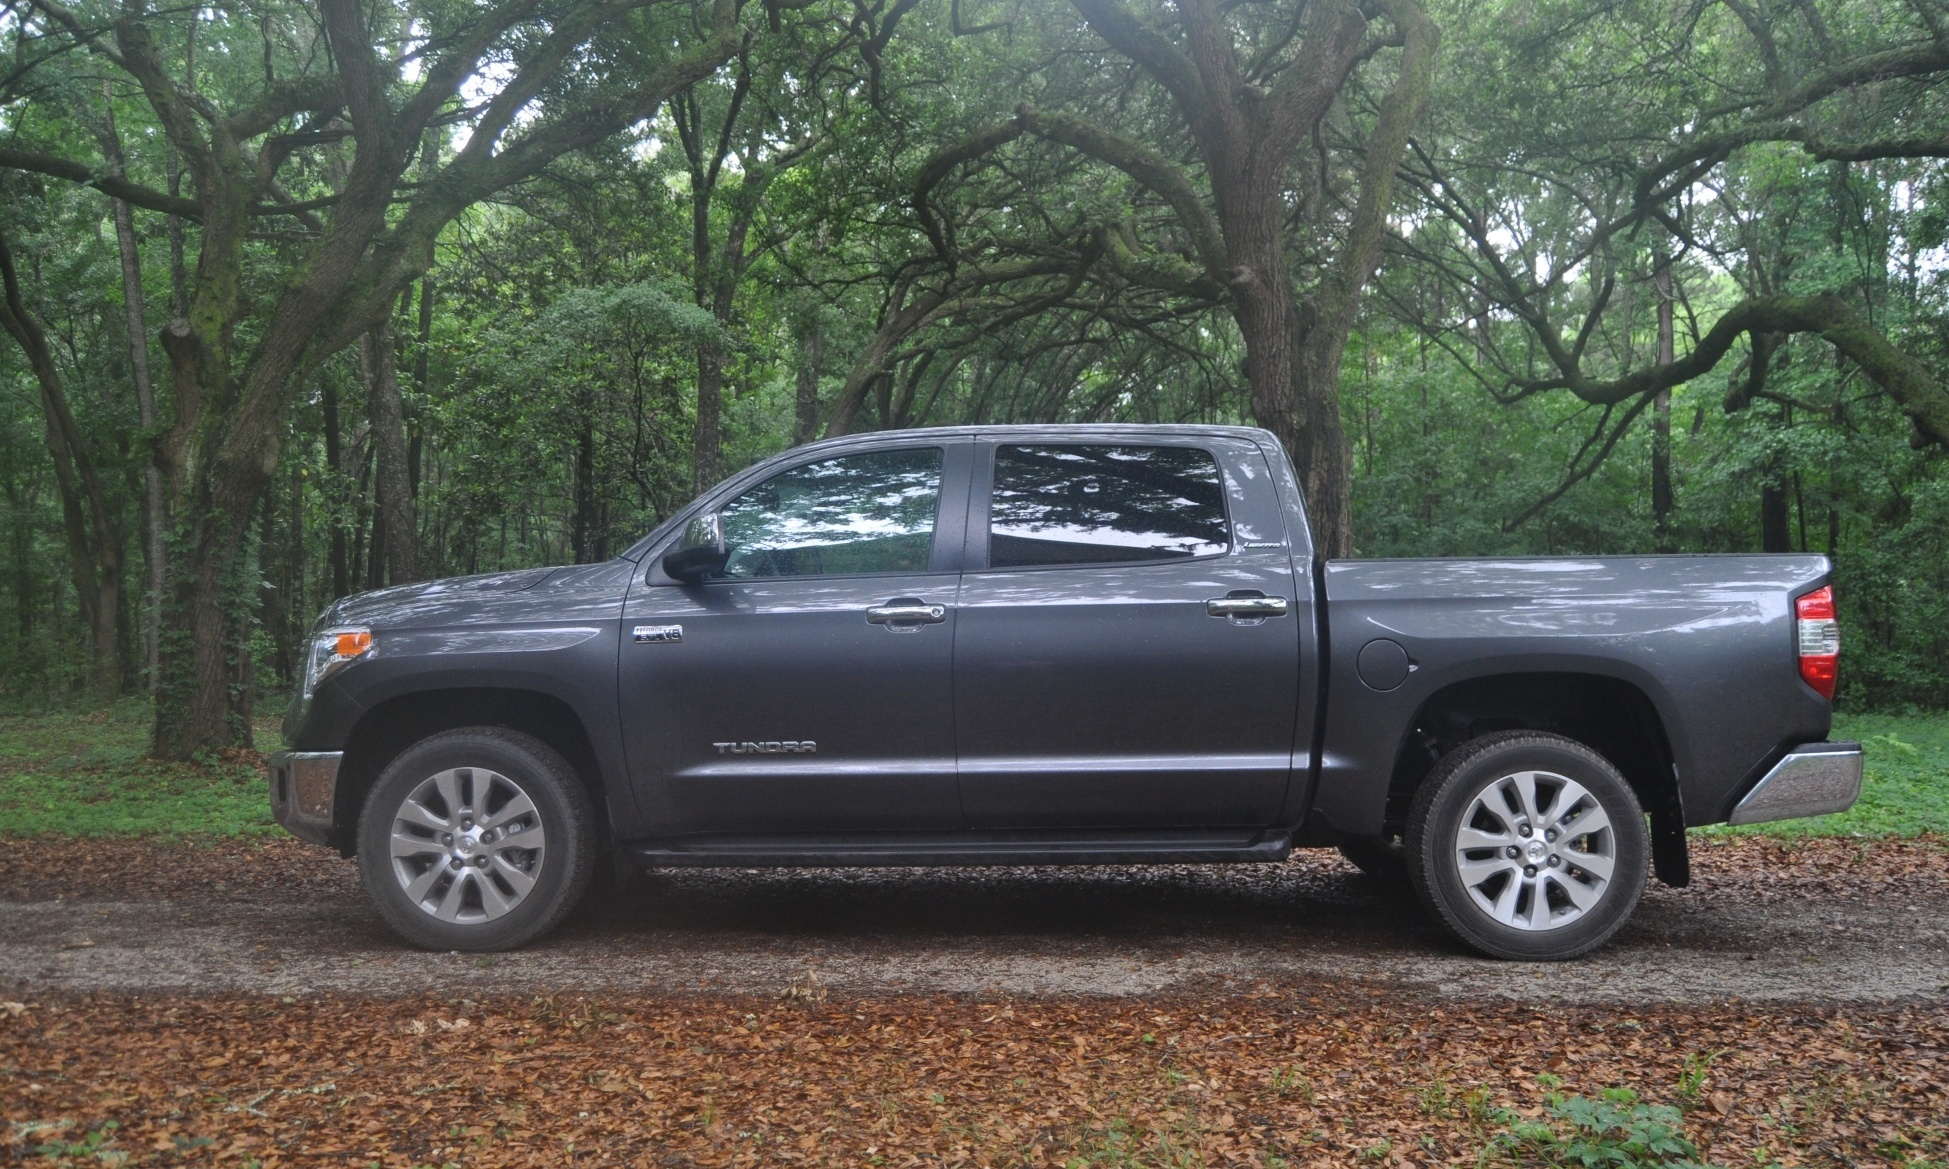 Toyota Tundra crewmax тест драйв #10